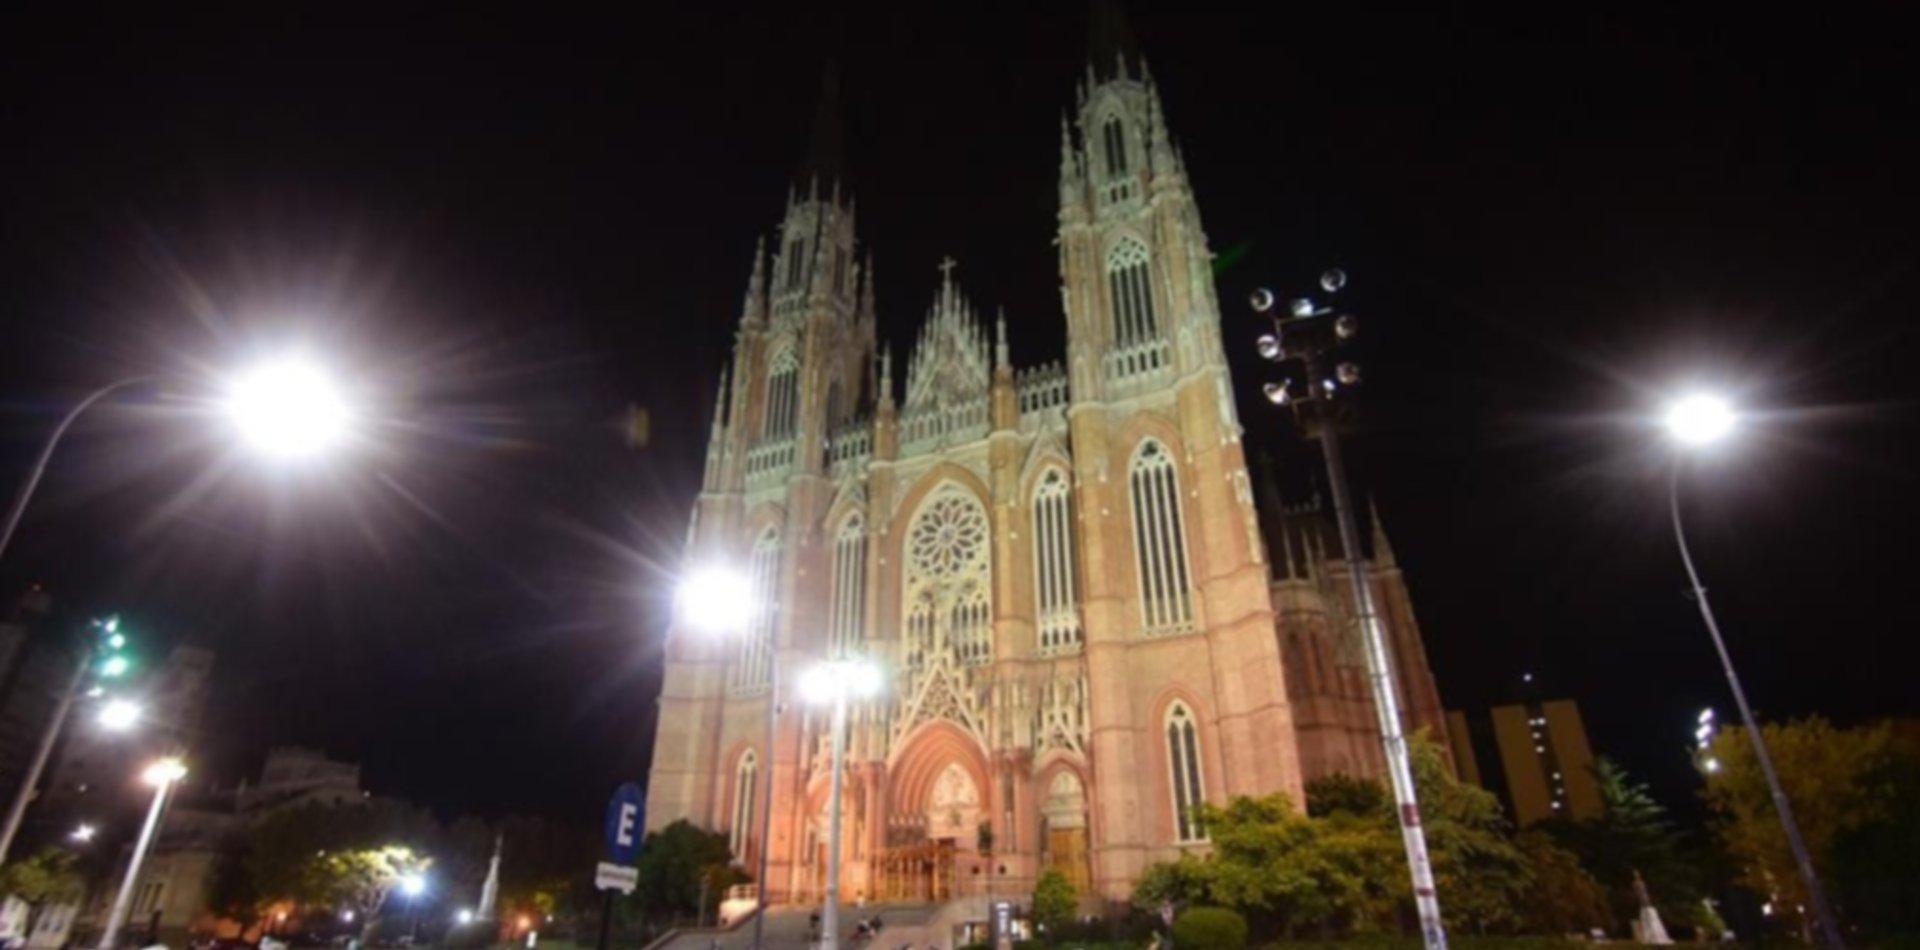 La Catedral platense recibe las Pascuas con nuevas luces Led